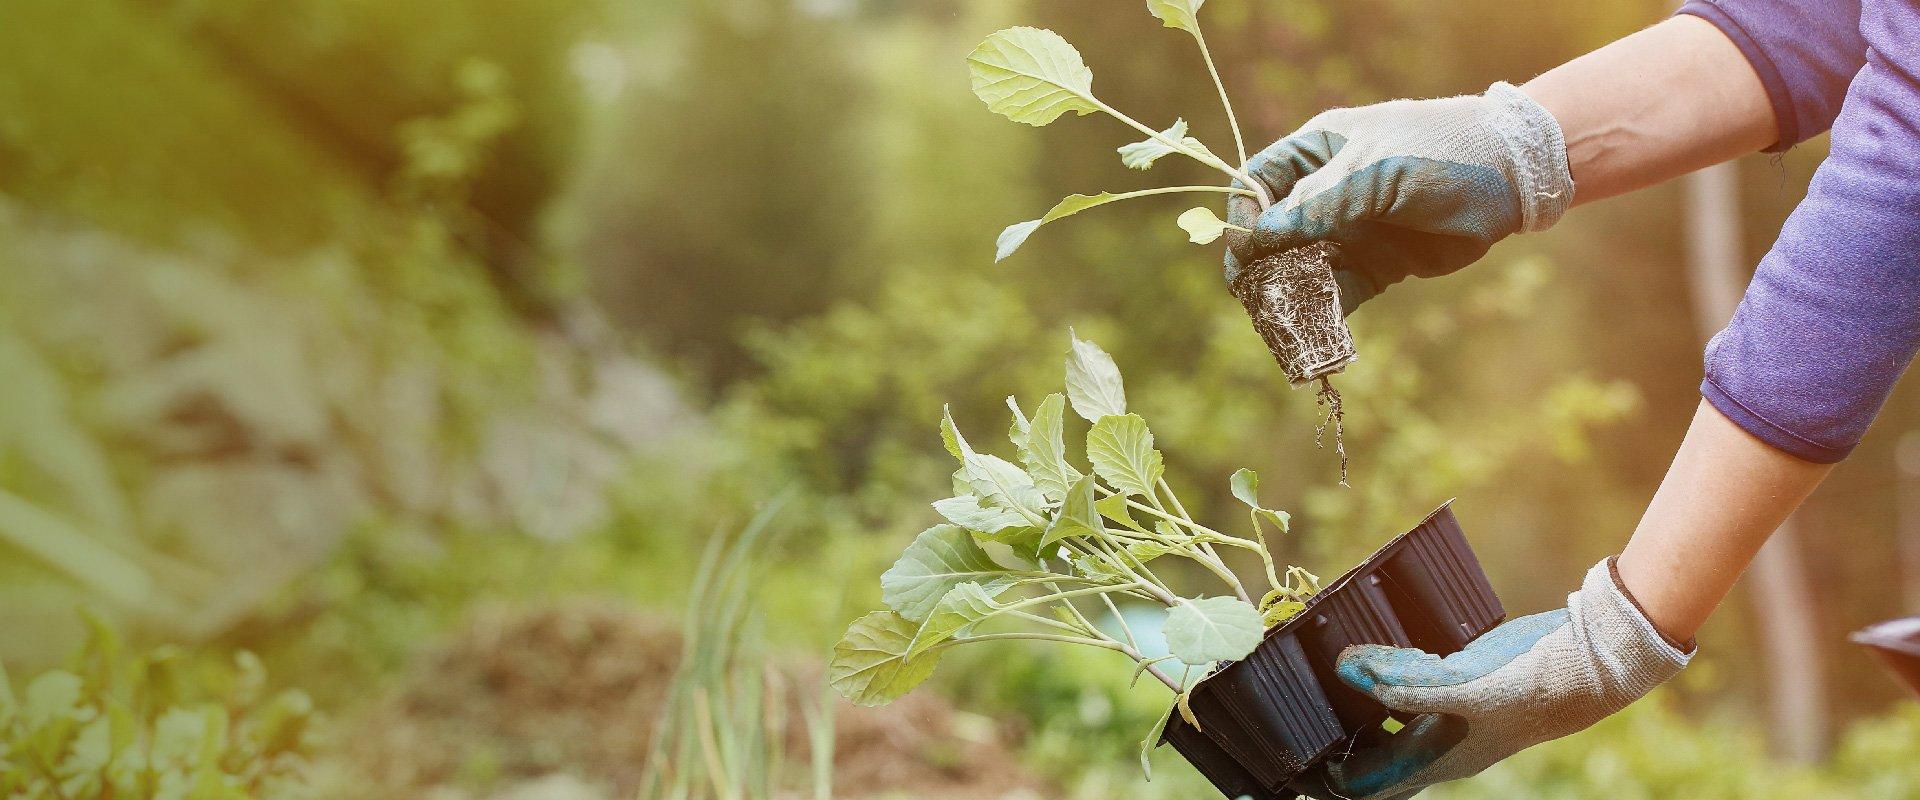 home-gardening-1